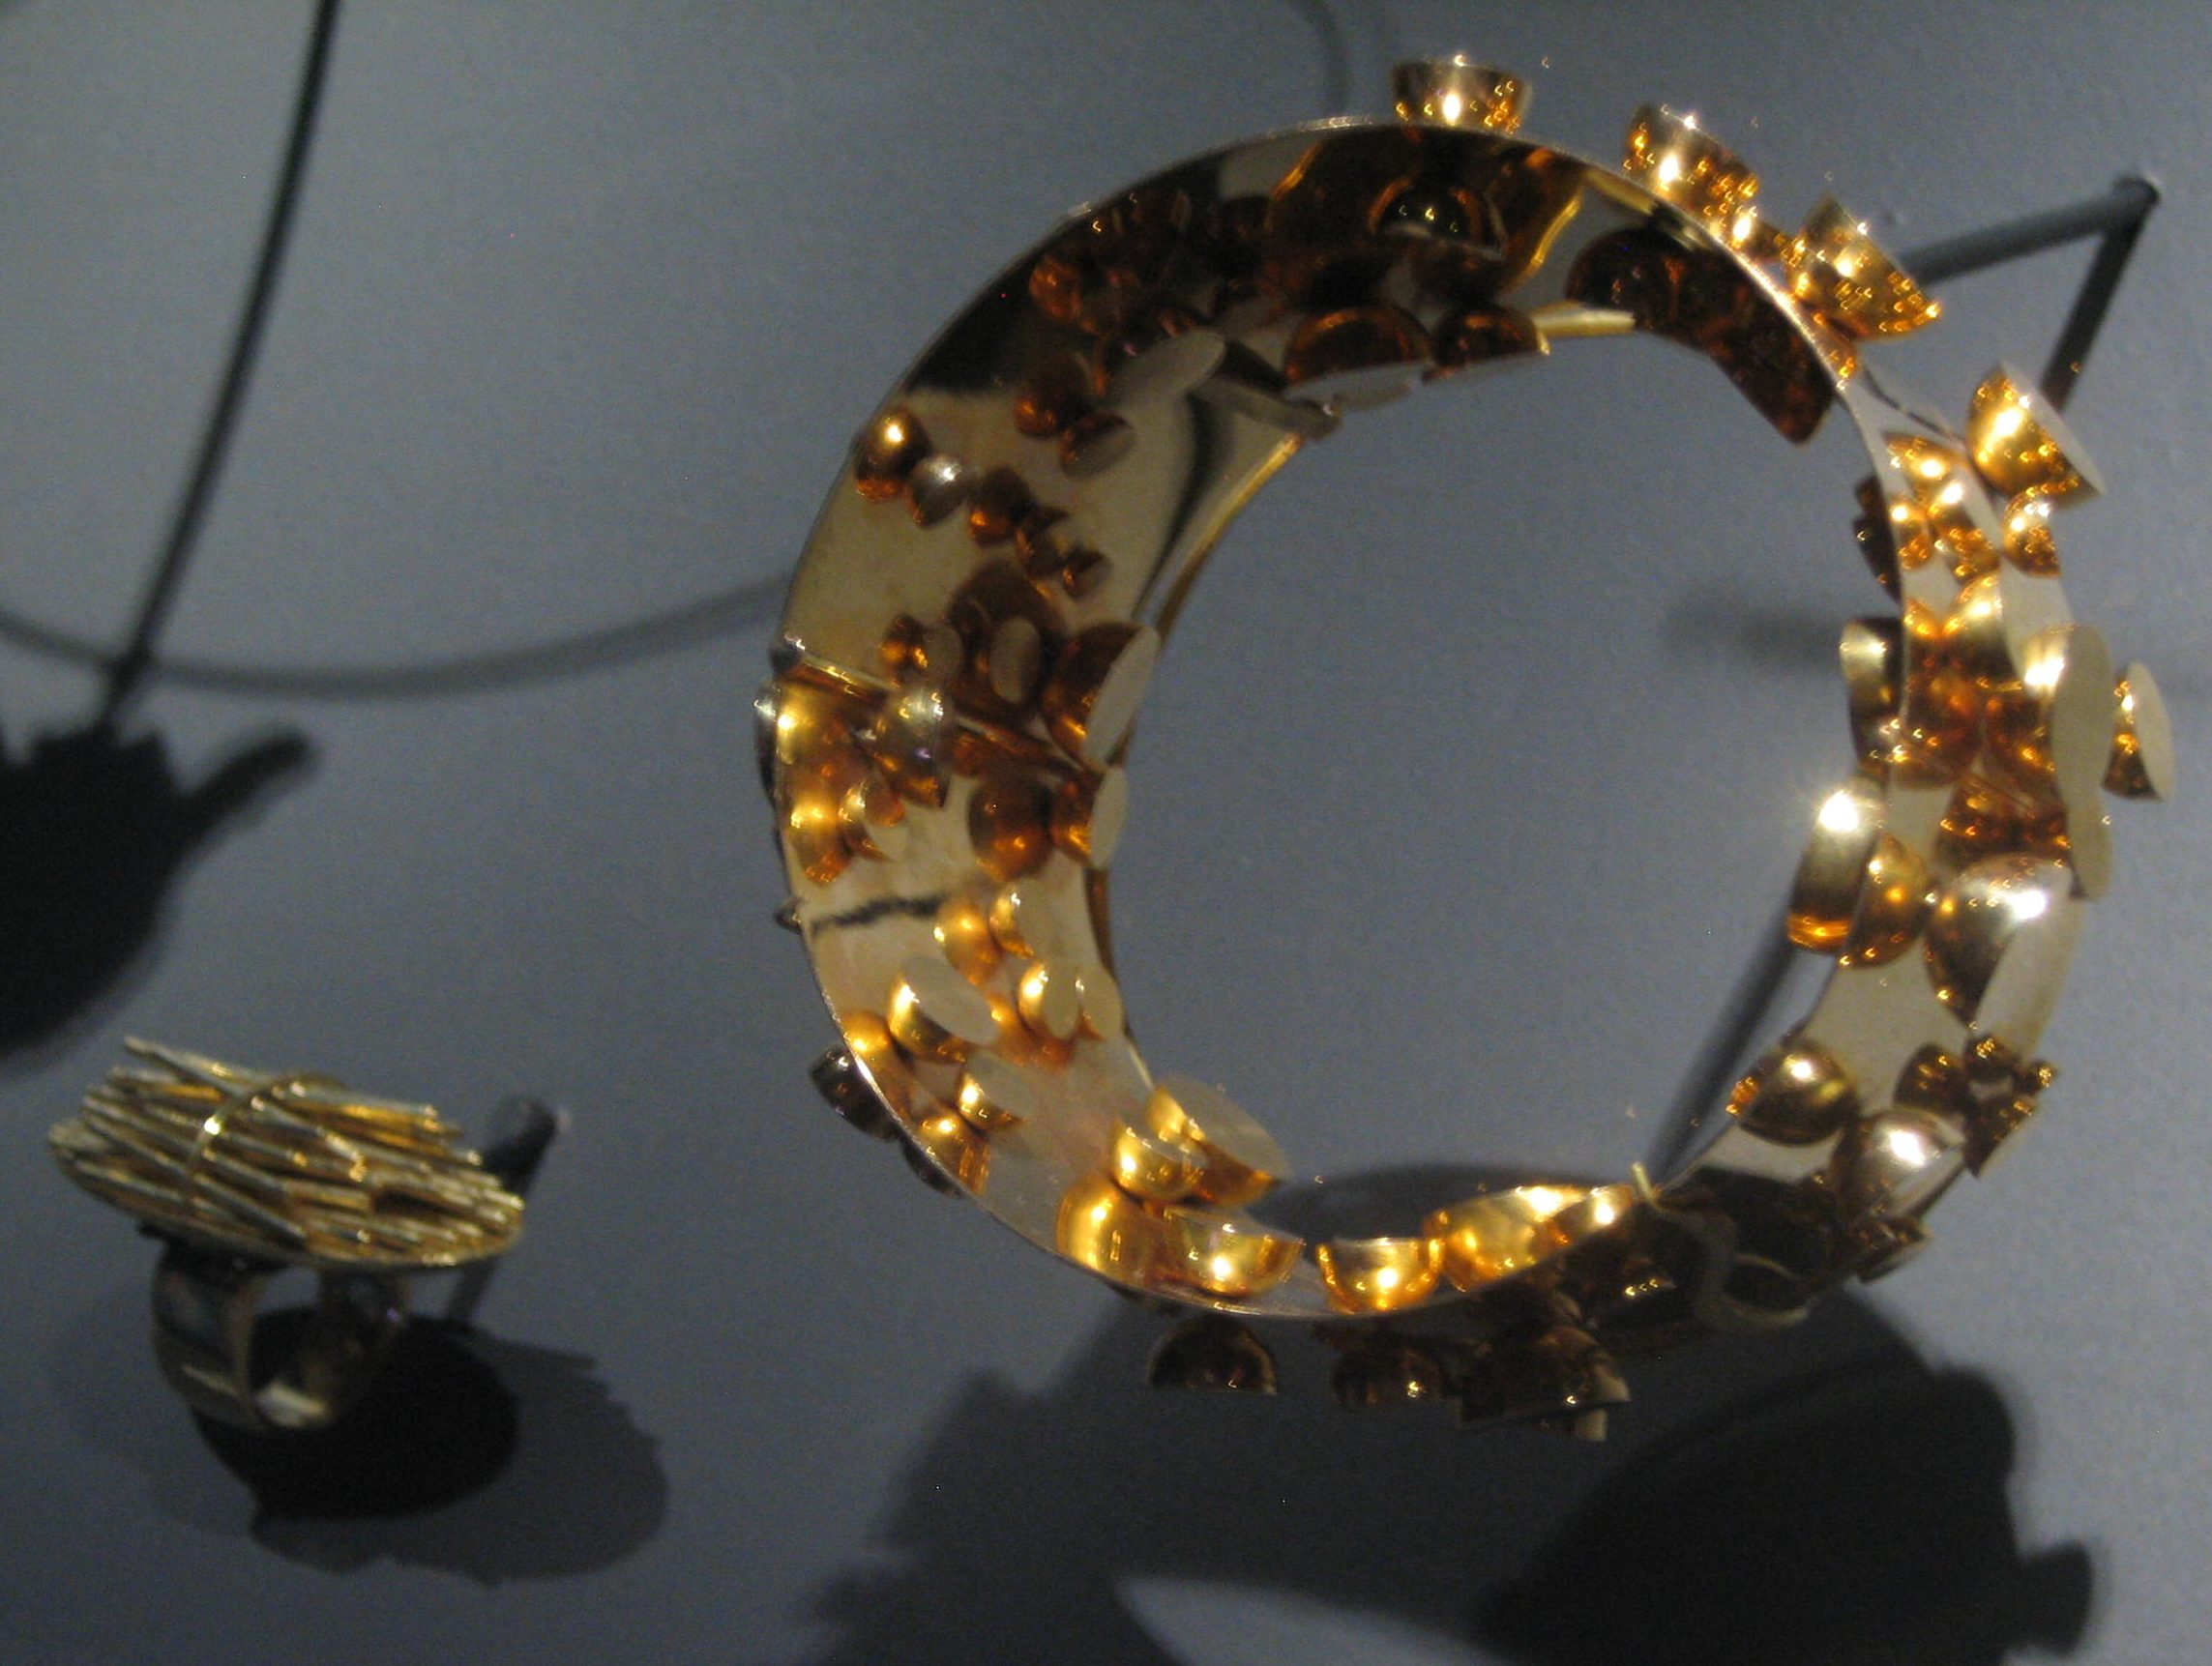 Pol Bury, Tiges en or et jaune, ring, 2003 en armband, 1968. Collectie Diane Venet. Foto Esther Doornbusch, juni 2018©